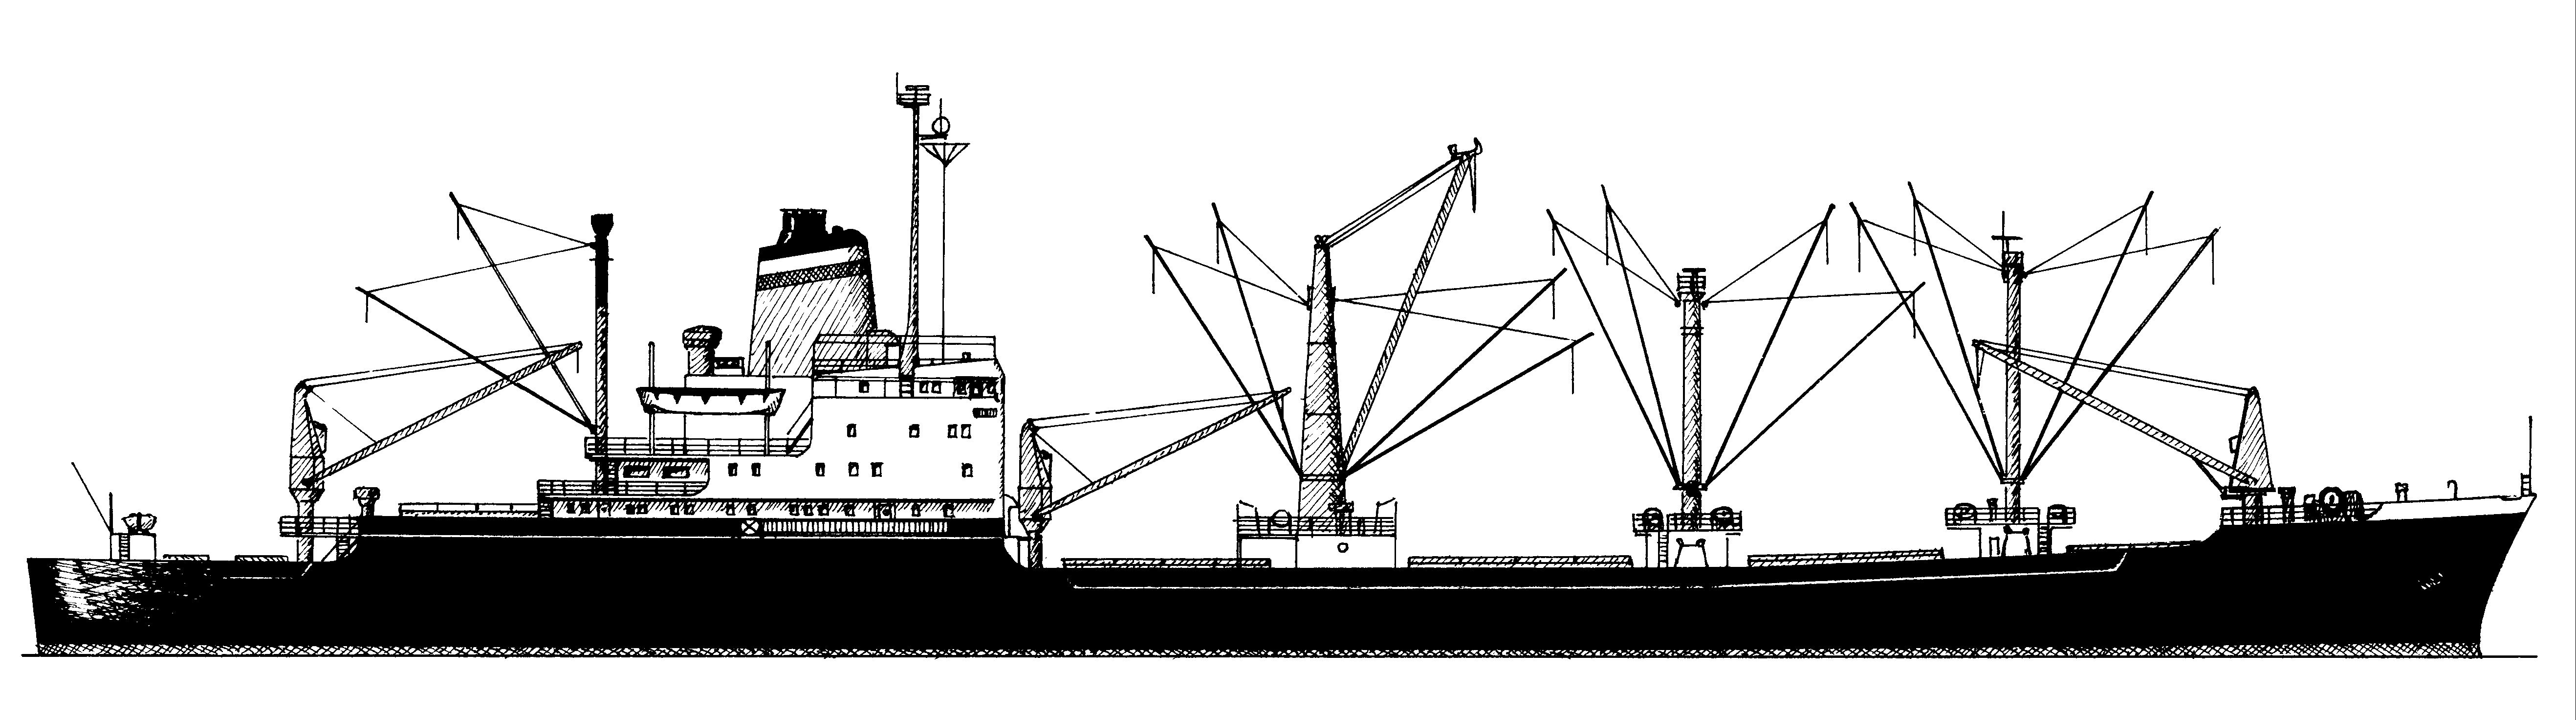 Die Friesenstein-Klasse (ab 1970 HAPAG Lloyd) - Zeichnung K.K. Krüger-Kopiske